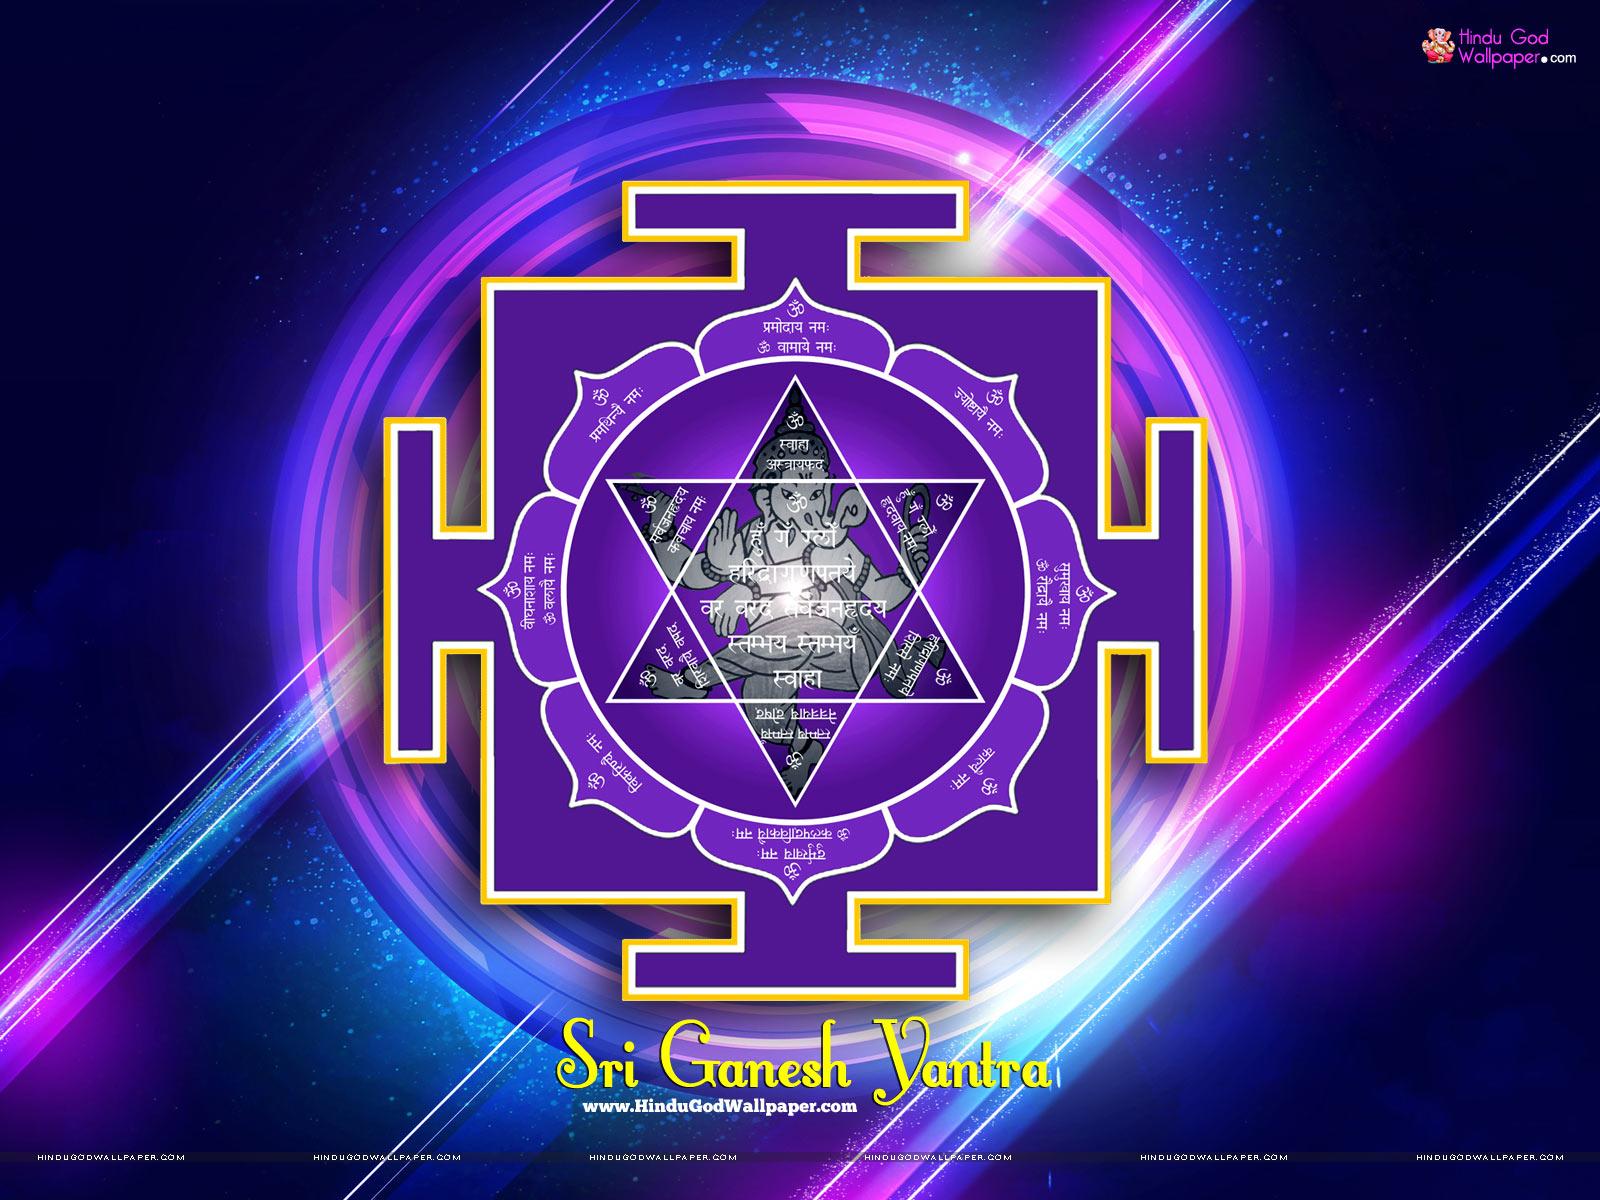 Wallpaper download ganesh - Wallpaper Download Ganesh 87